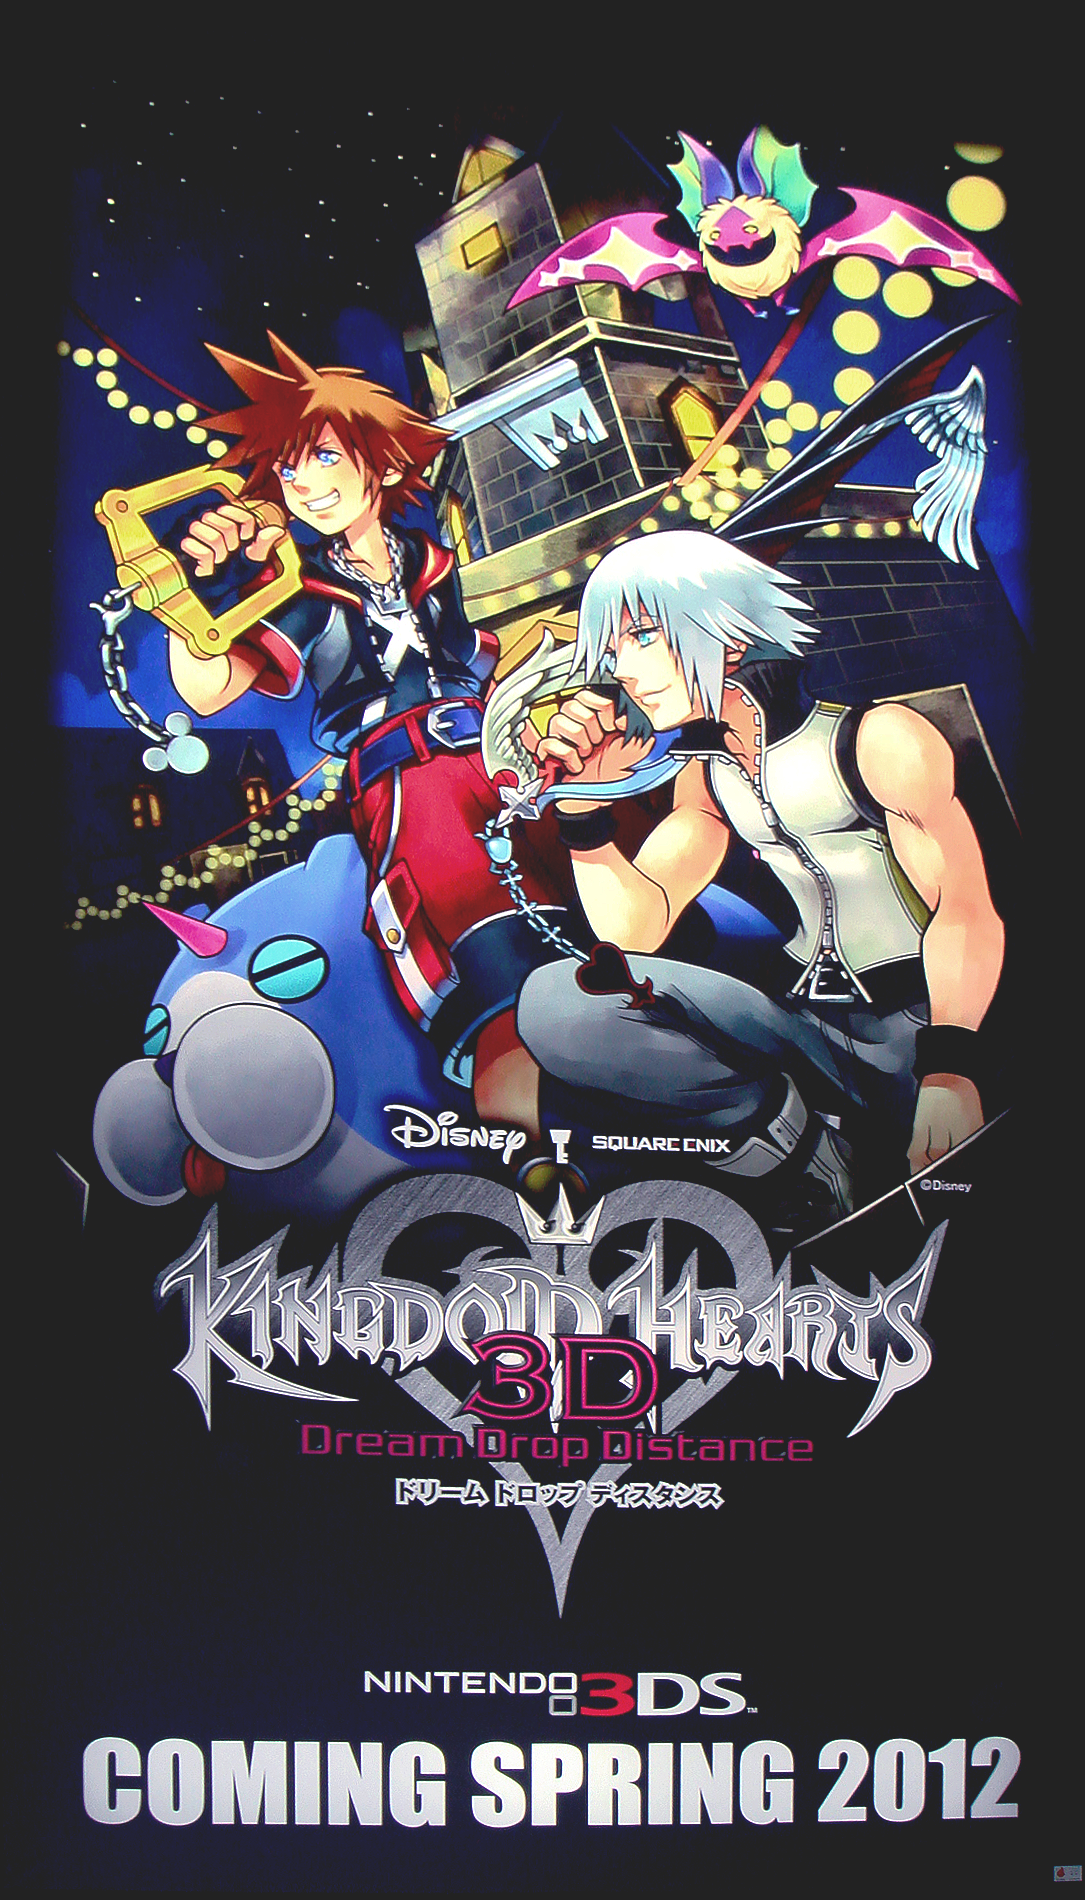 poster_kingdomhearts.png